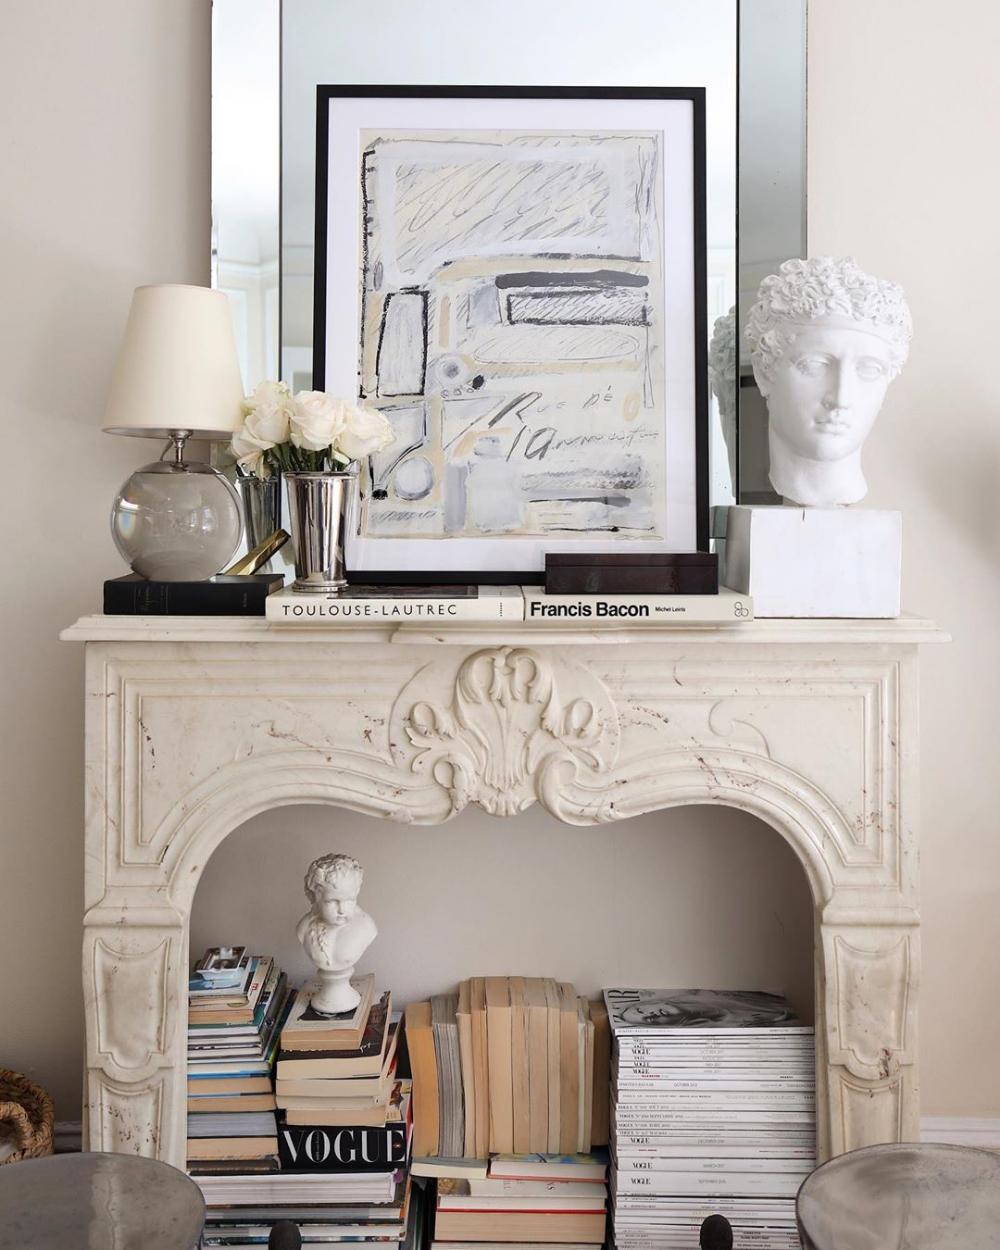 10 Creative Ways To Store Books That Aren T Bookshelves Fireplace Mantel Decor House Interior Home Decor